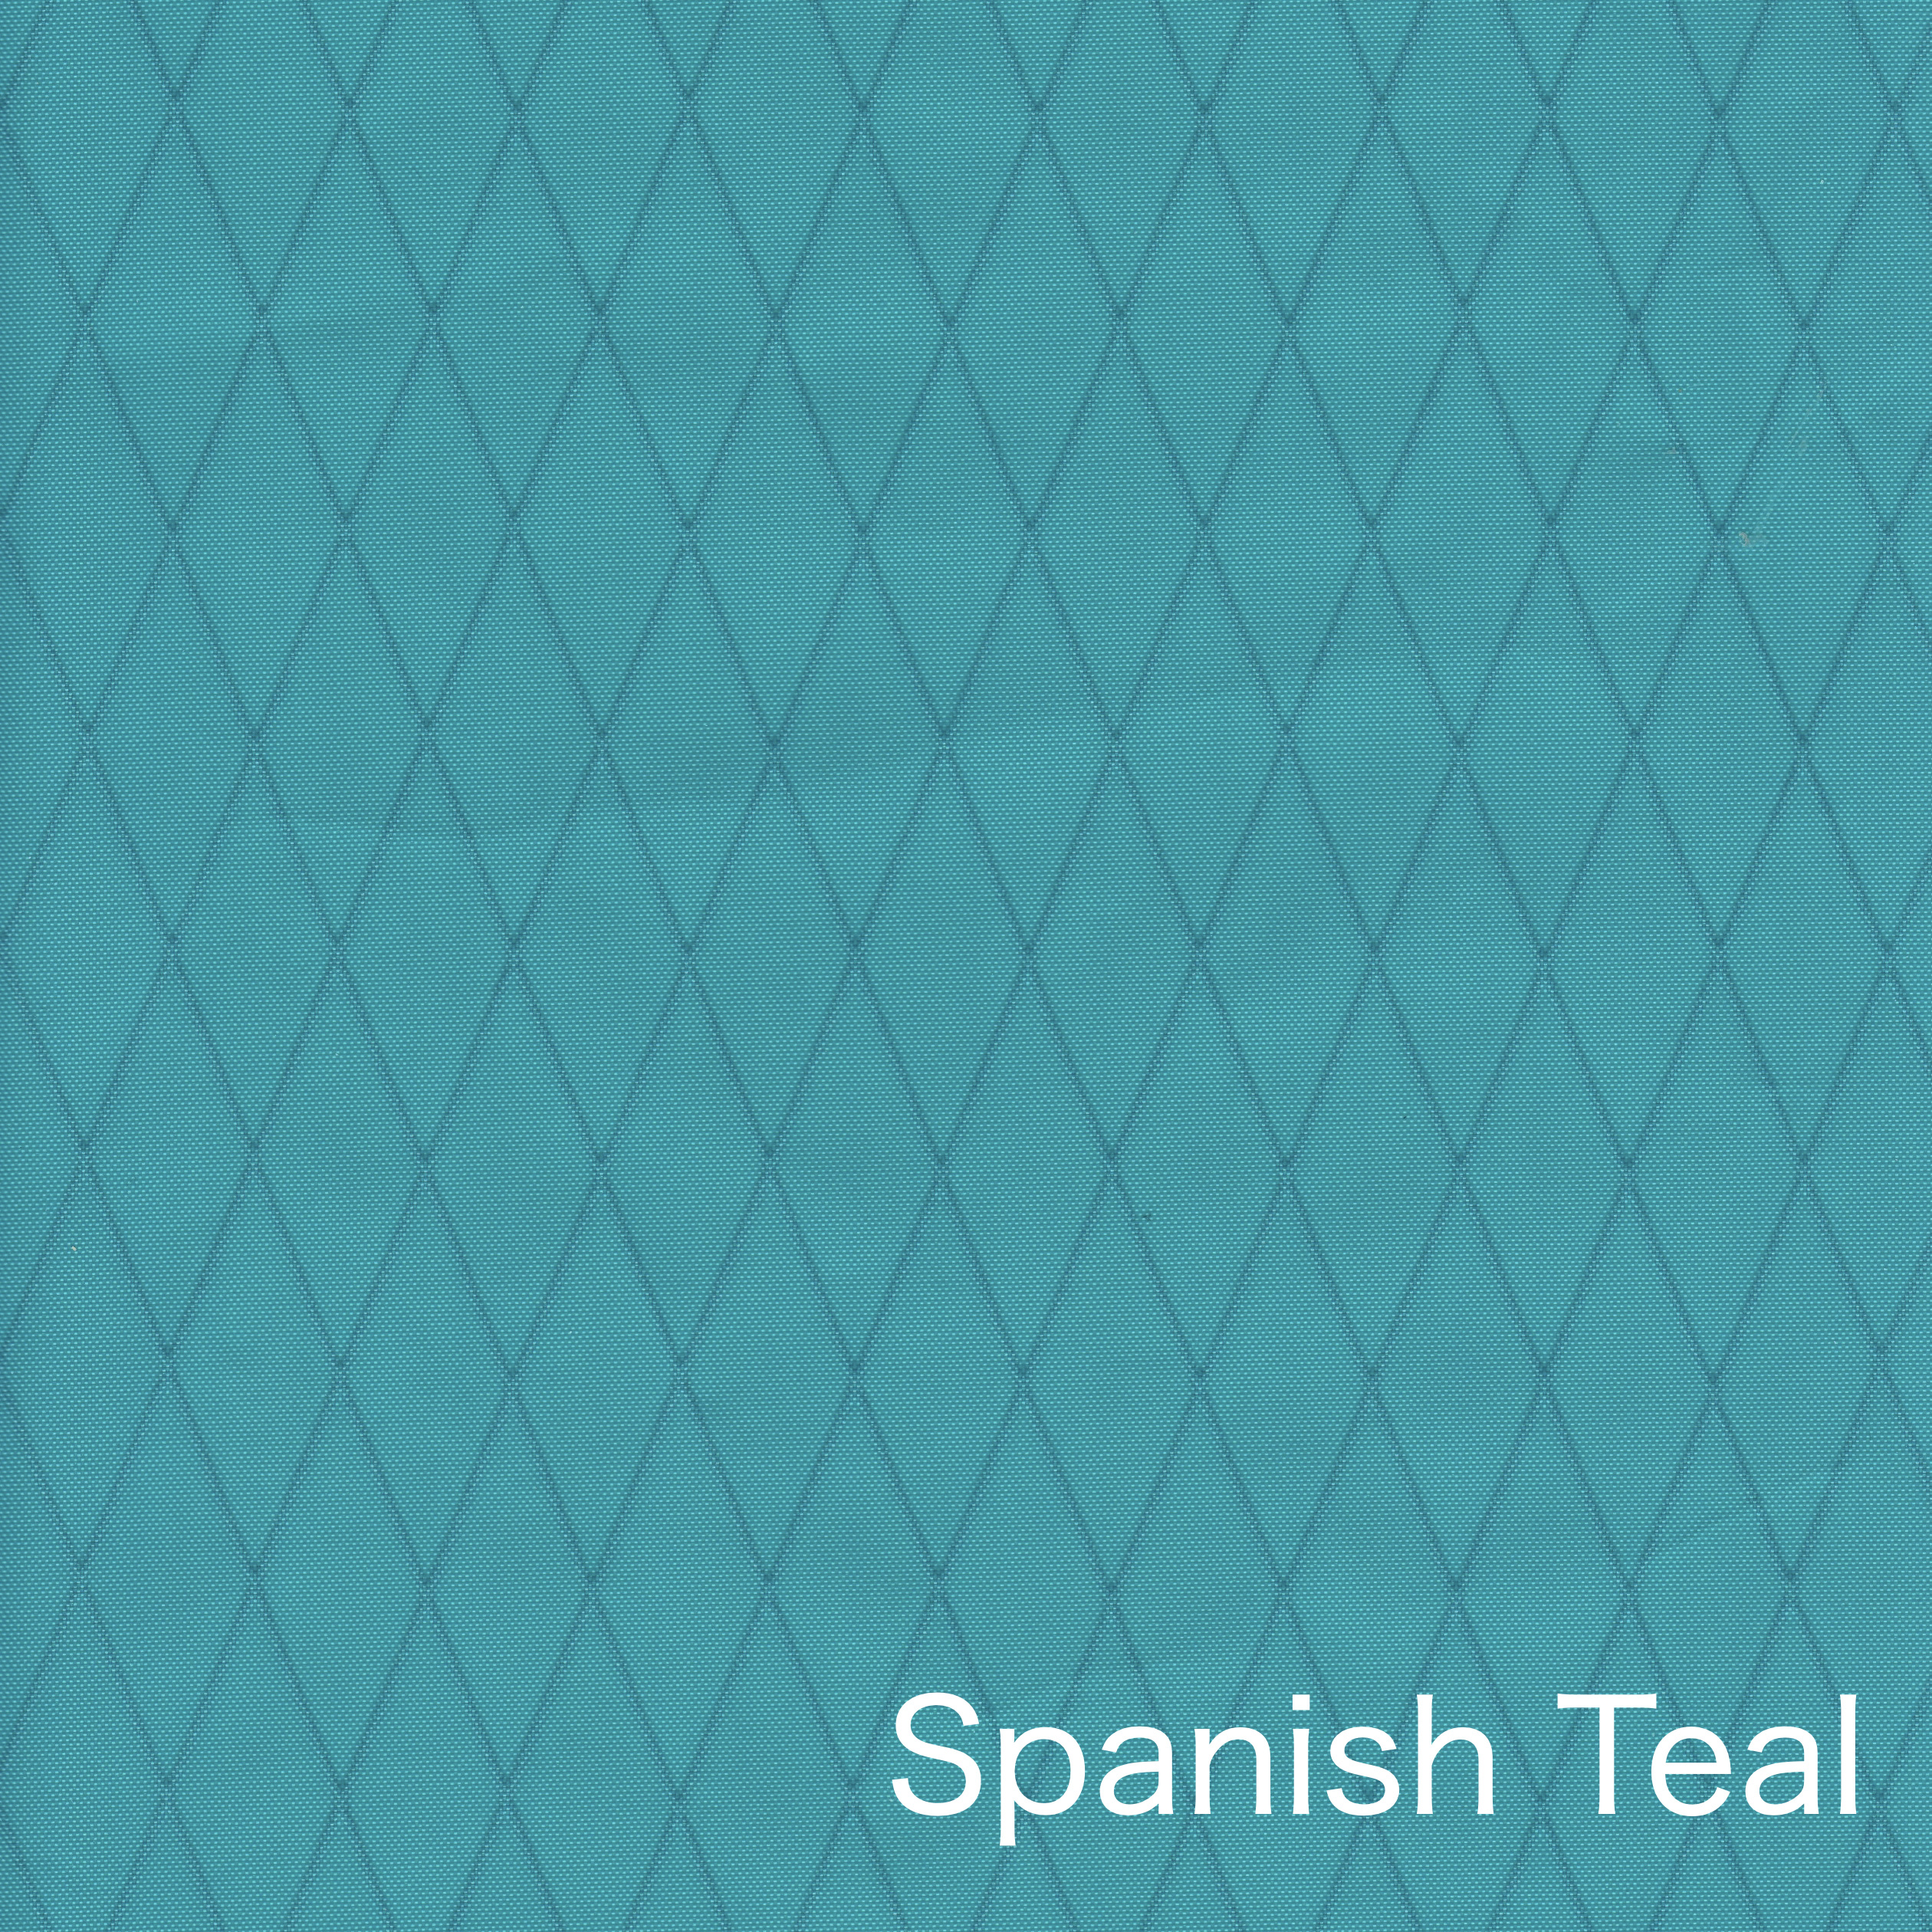 Spanish Teal